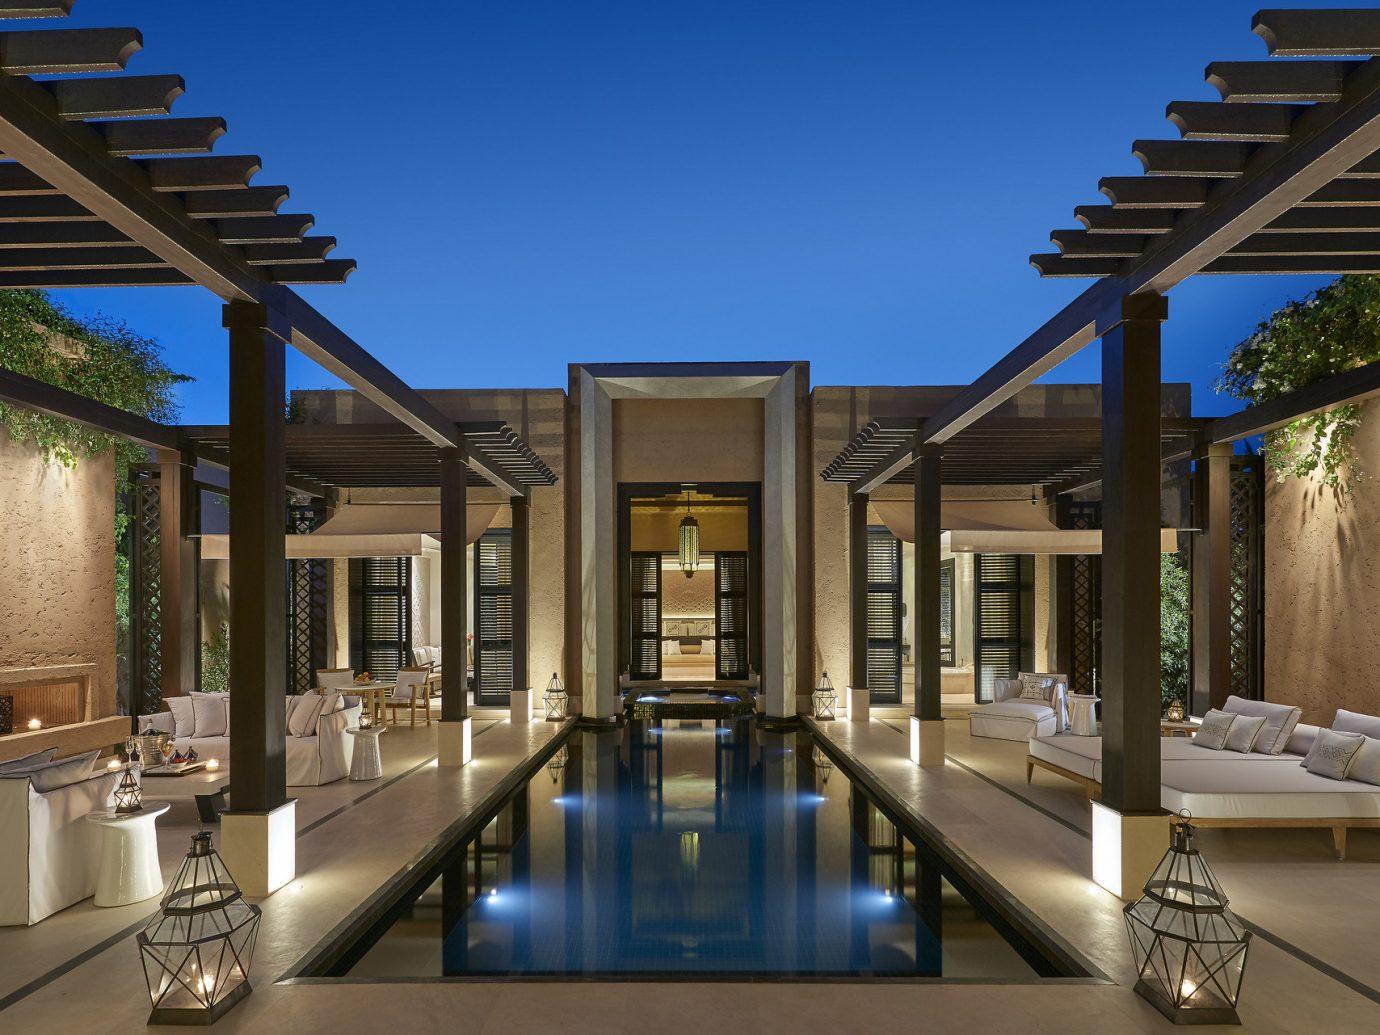 Trip Ideas property estate condominium Architecture swimming pool home Resort mansion Villa real estate interior design Courtyard Island colonnade